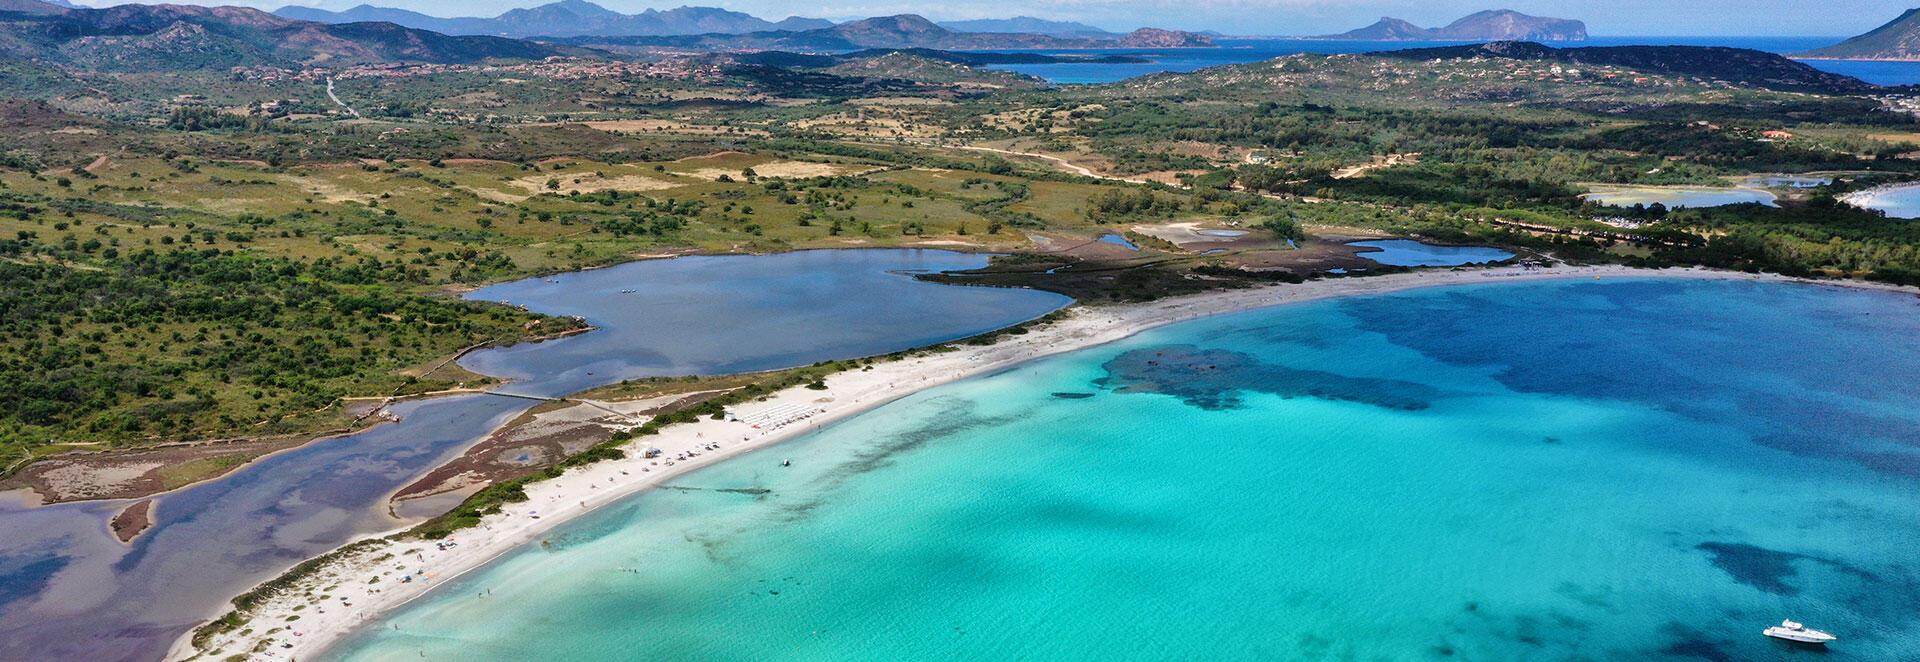 santeodoro en beaches-and-itineraries 003